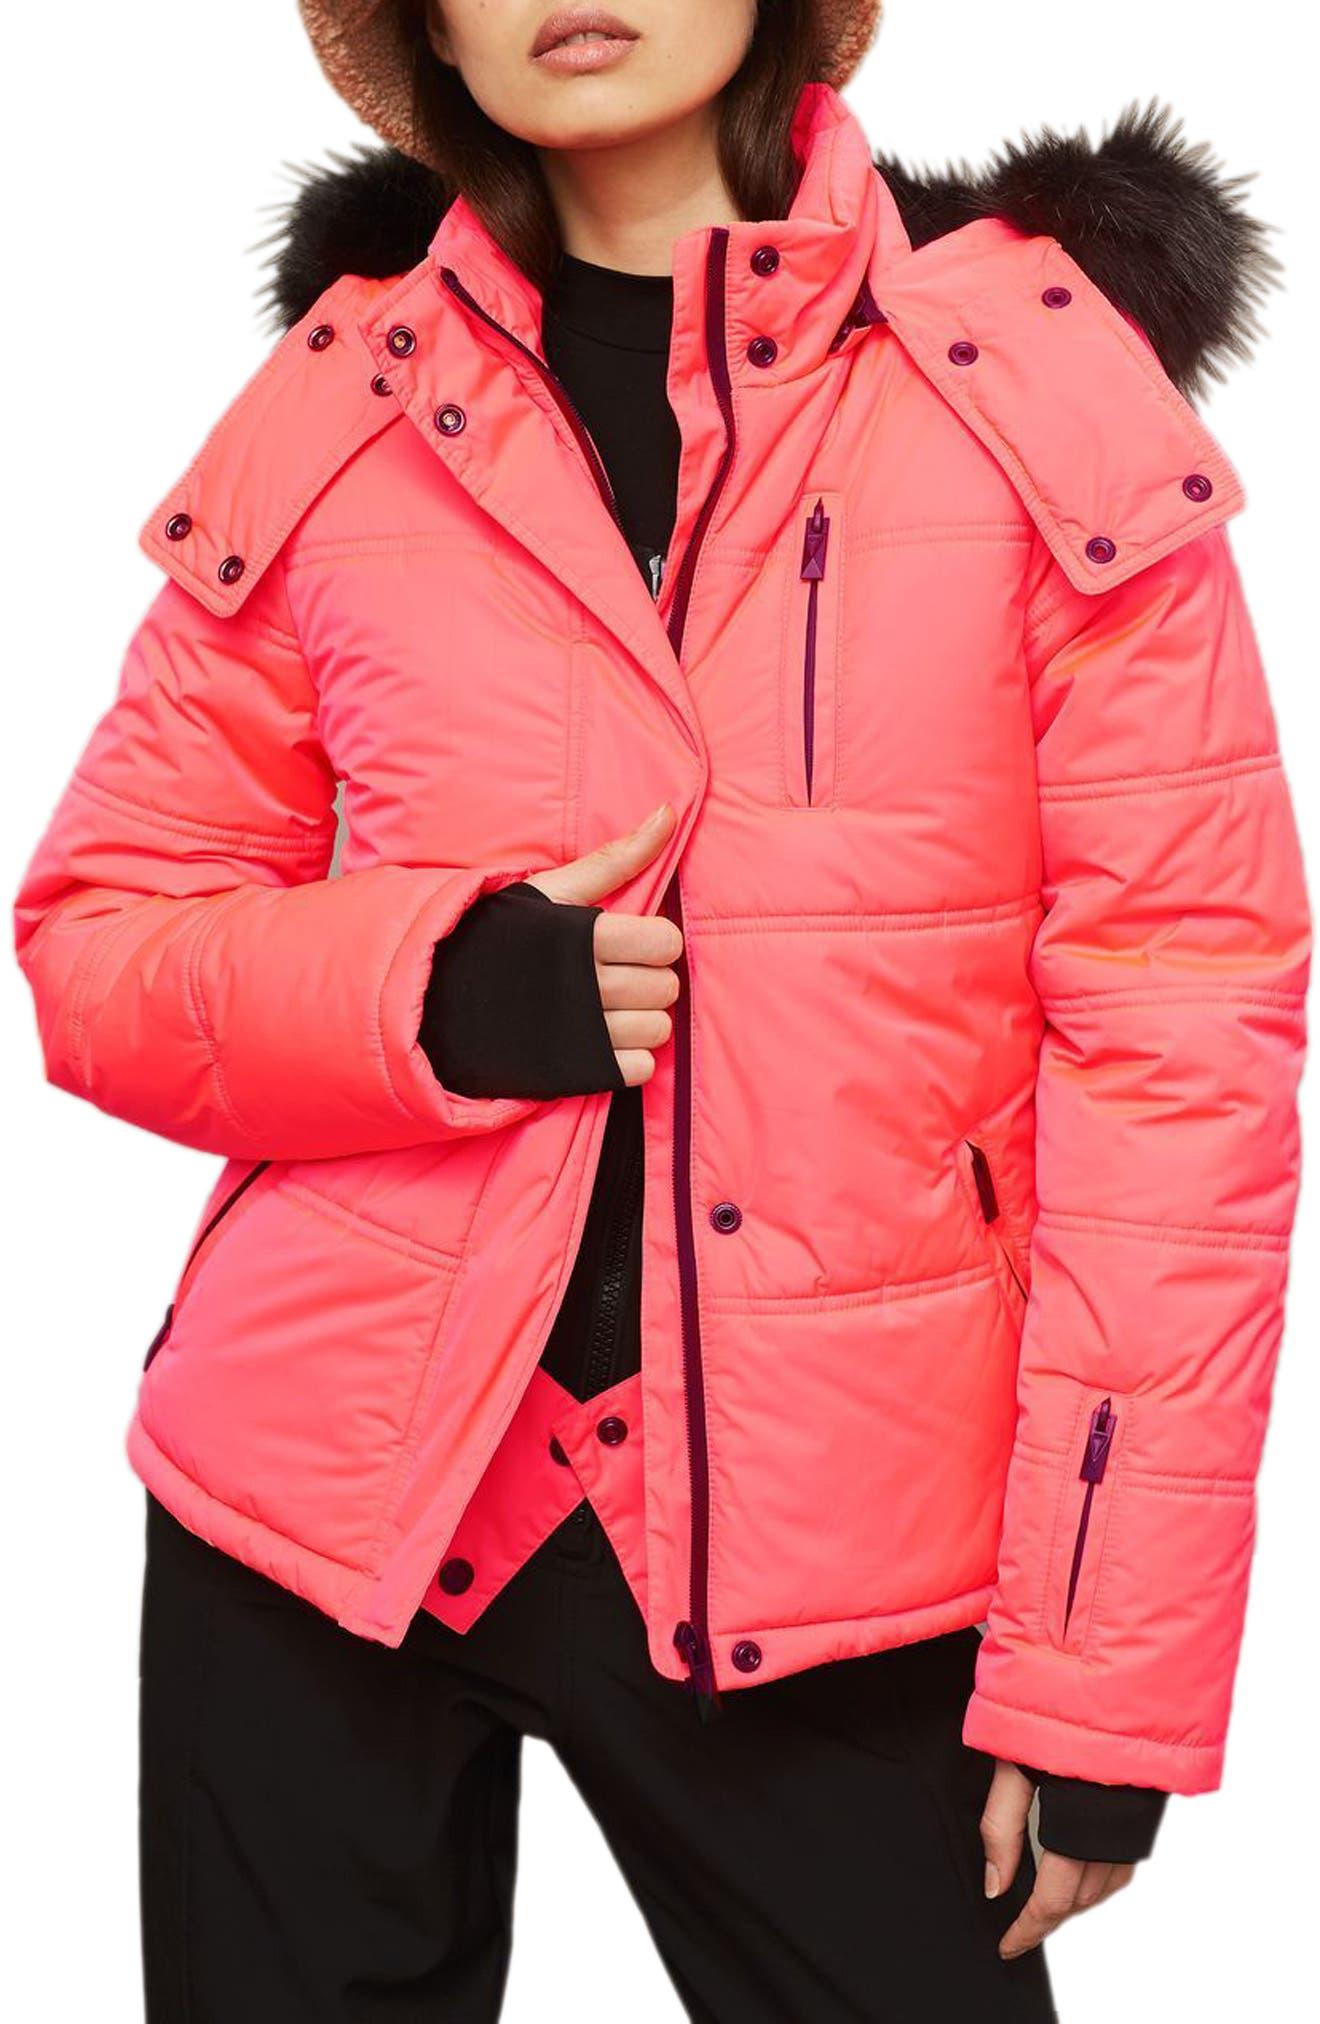 Main Image - Topshop SNO Rio Faux Fur Hood Neon Puffer Jacket